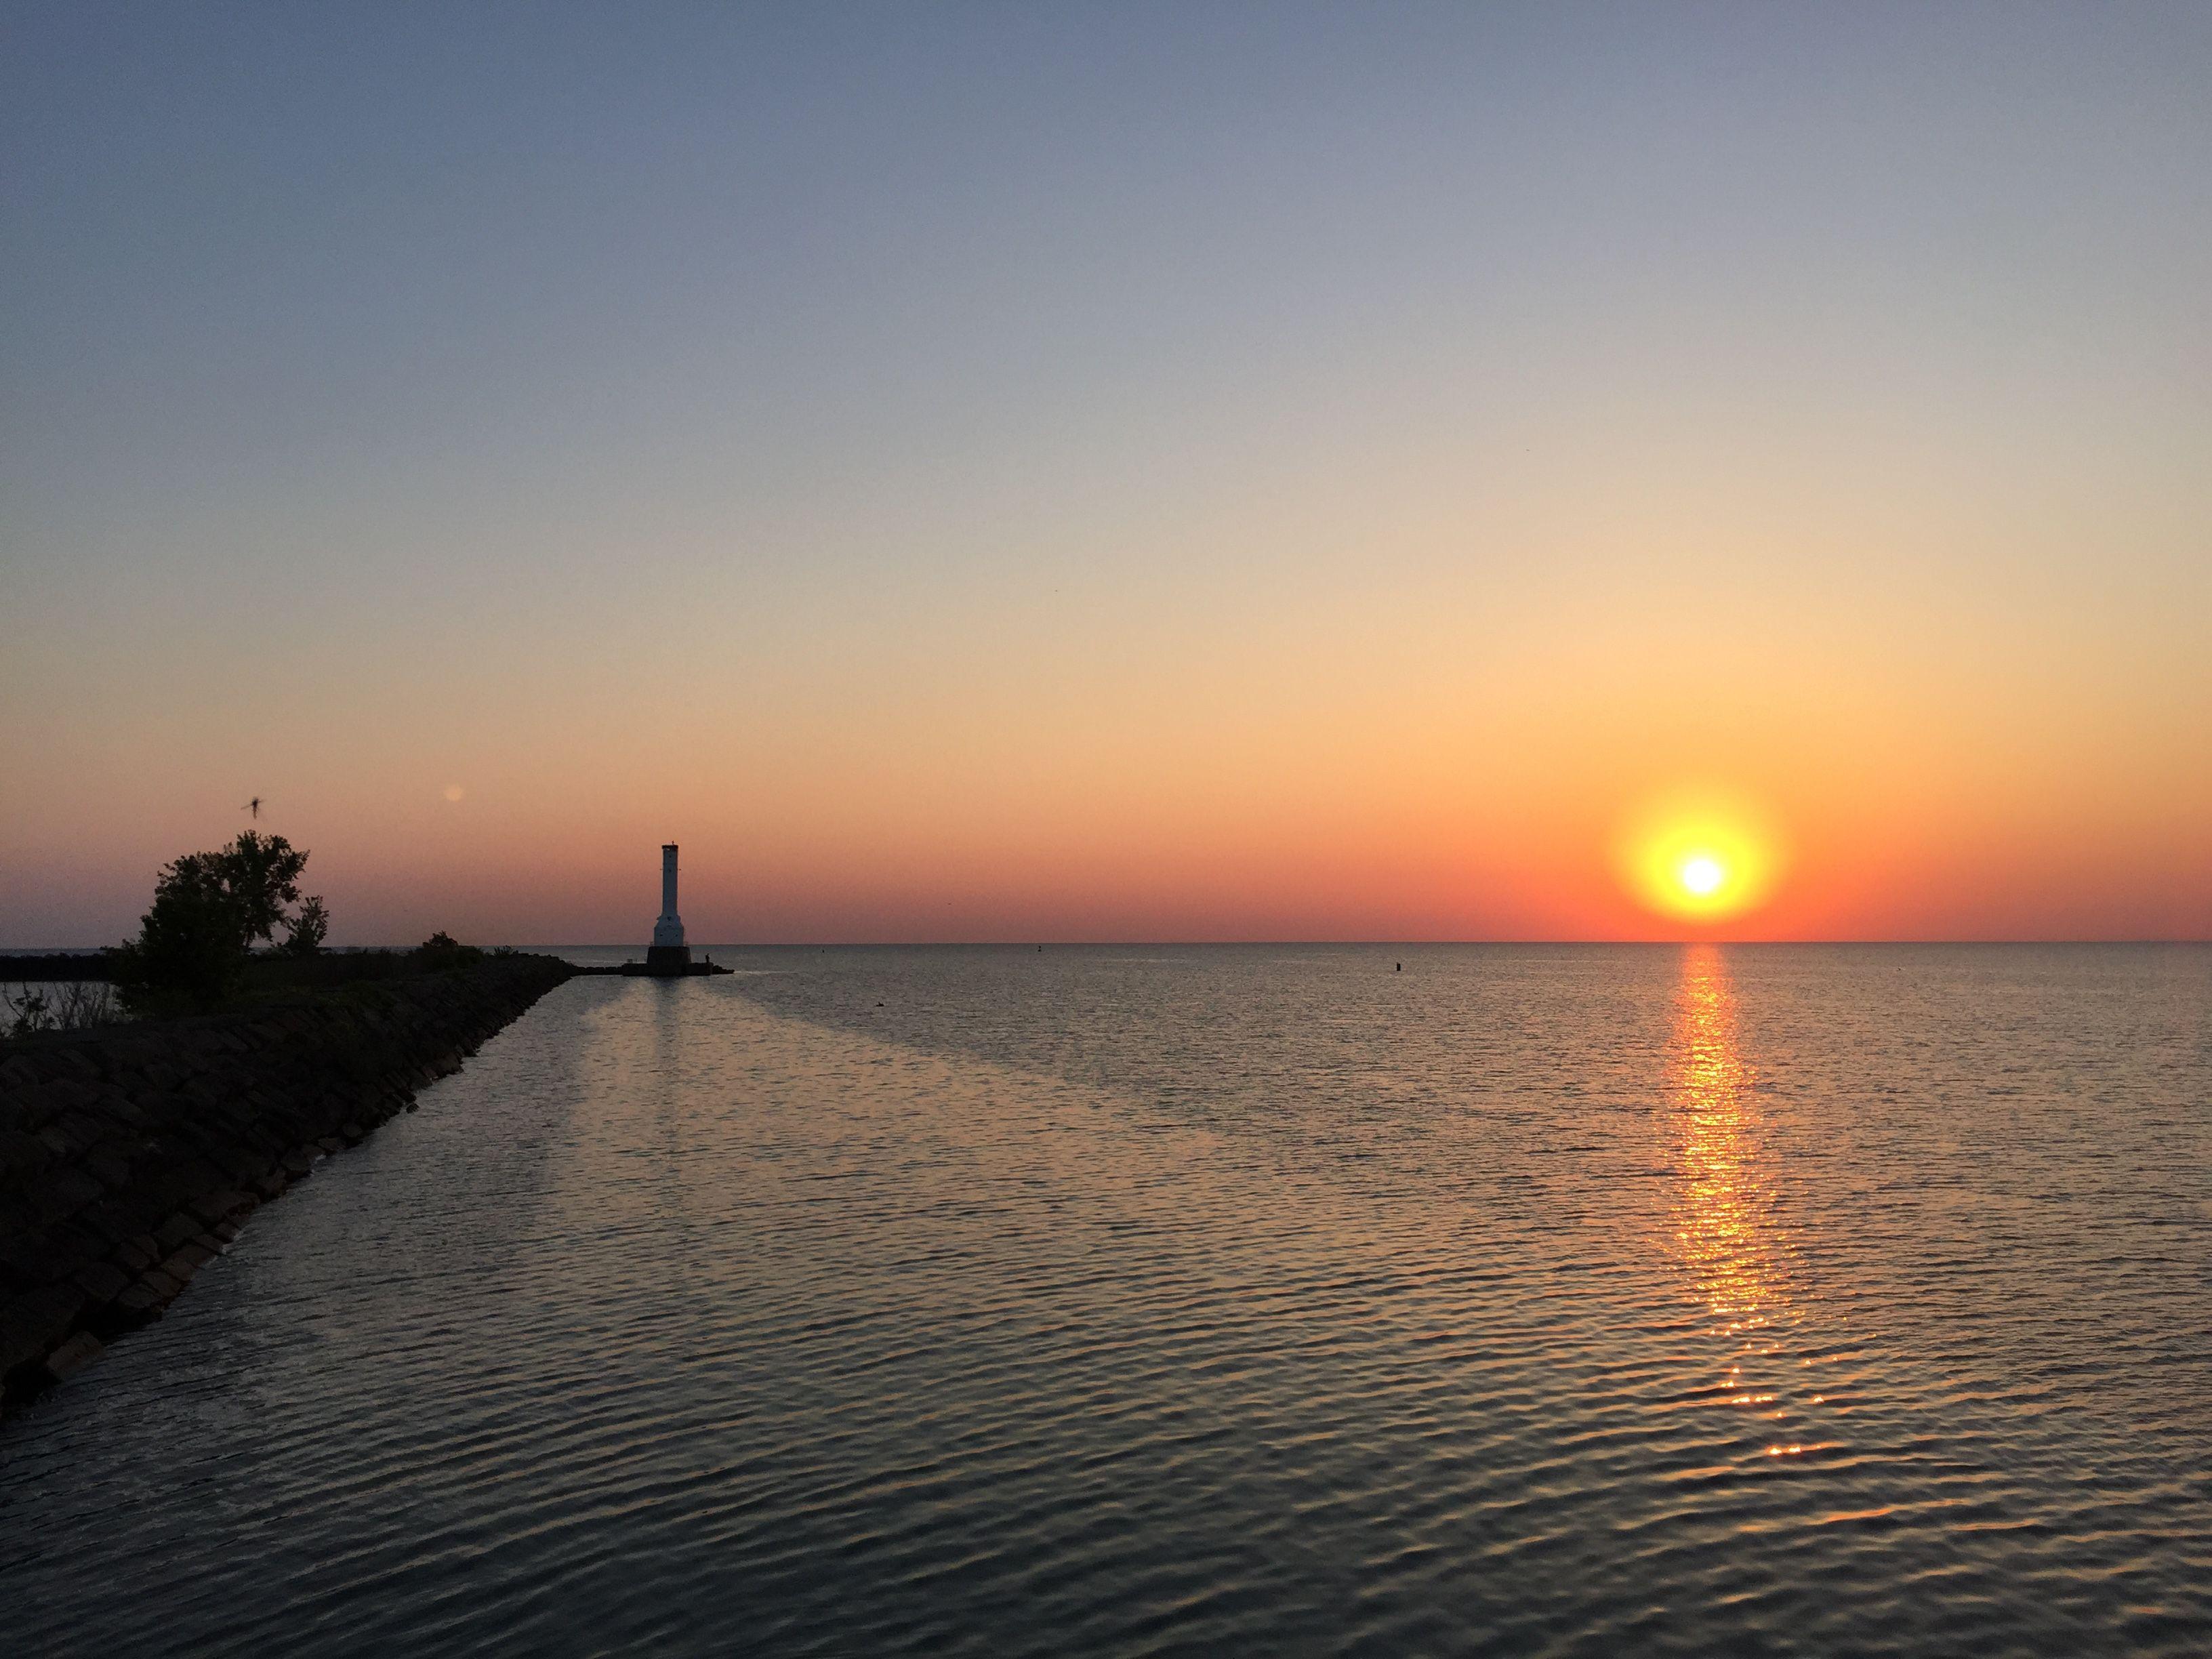 Sunrise At The Huron Pier Lighthouse